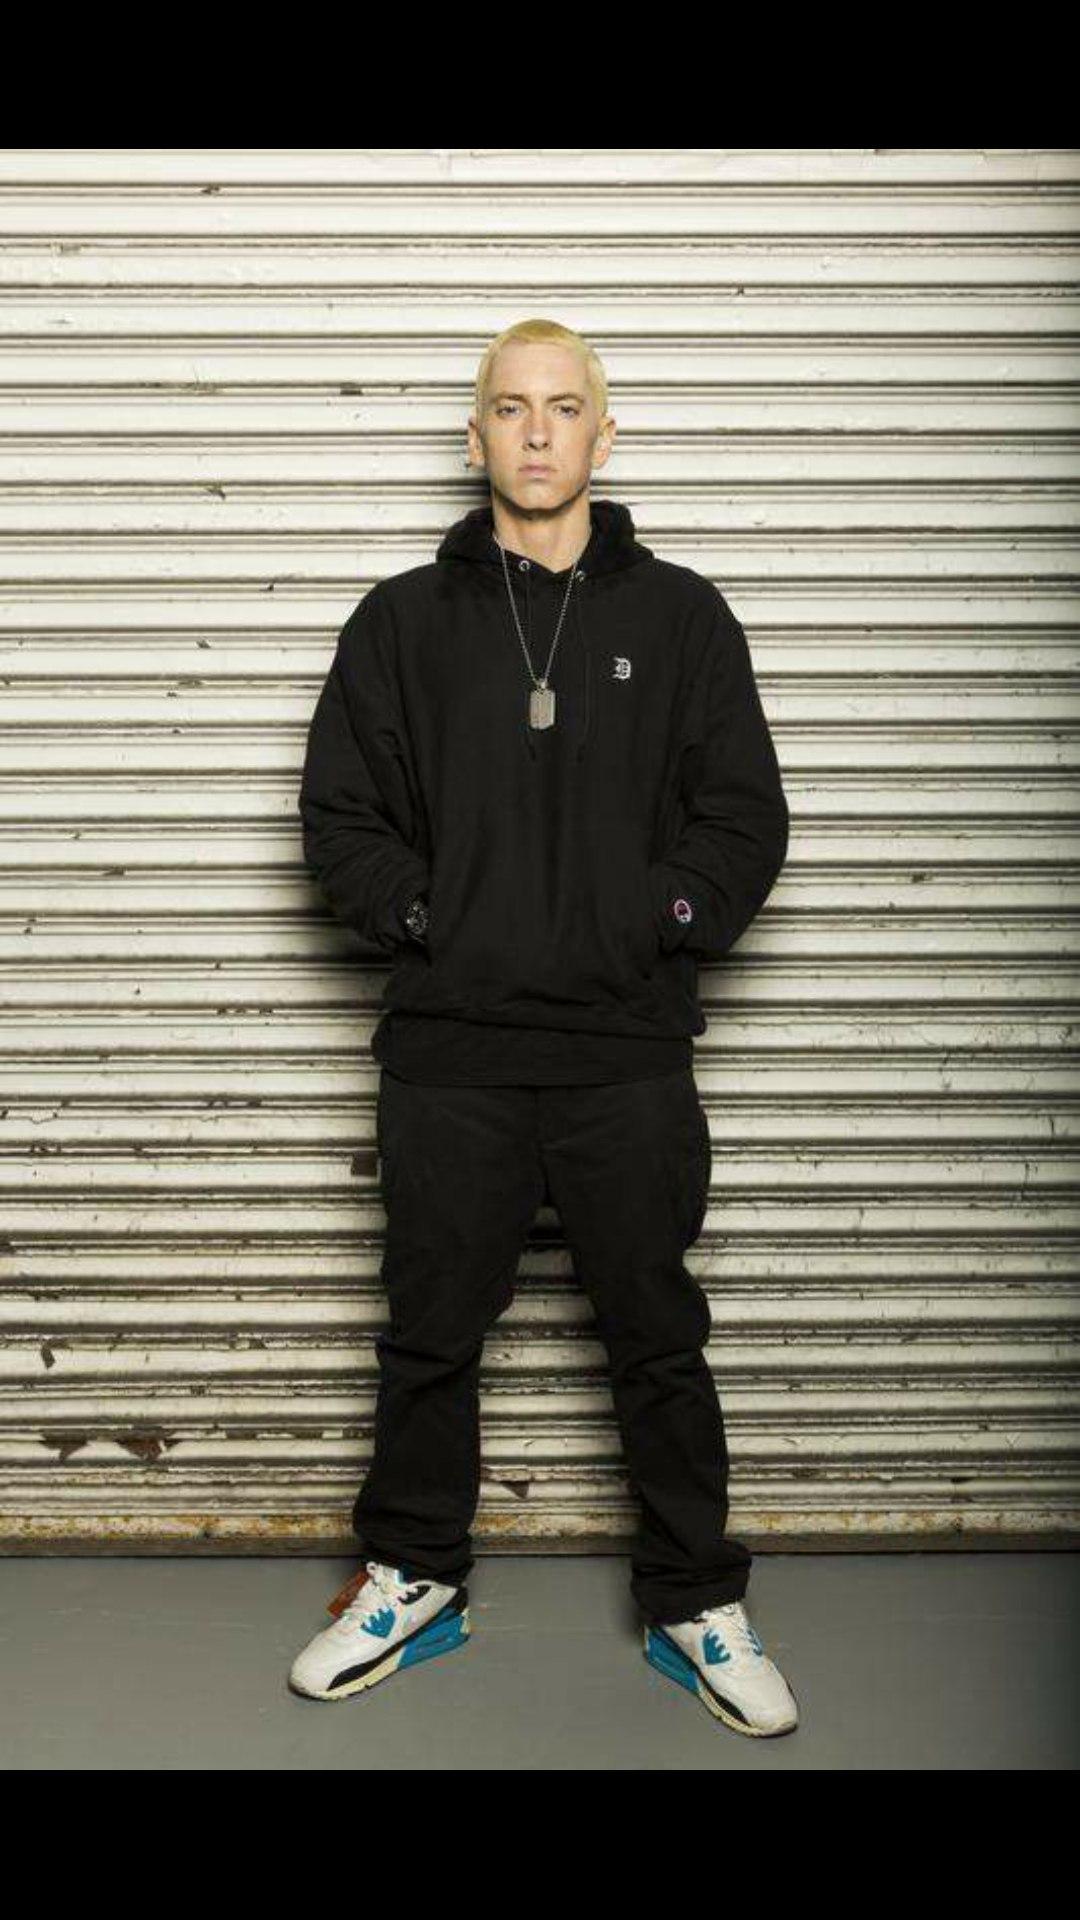 Eminem Wallpapers for Iphone 7 Iphone 7 plus Iphone 6 plus 1080x1920